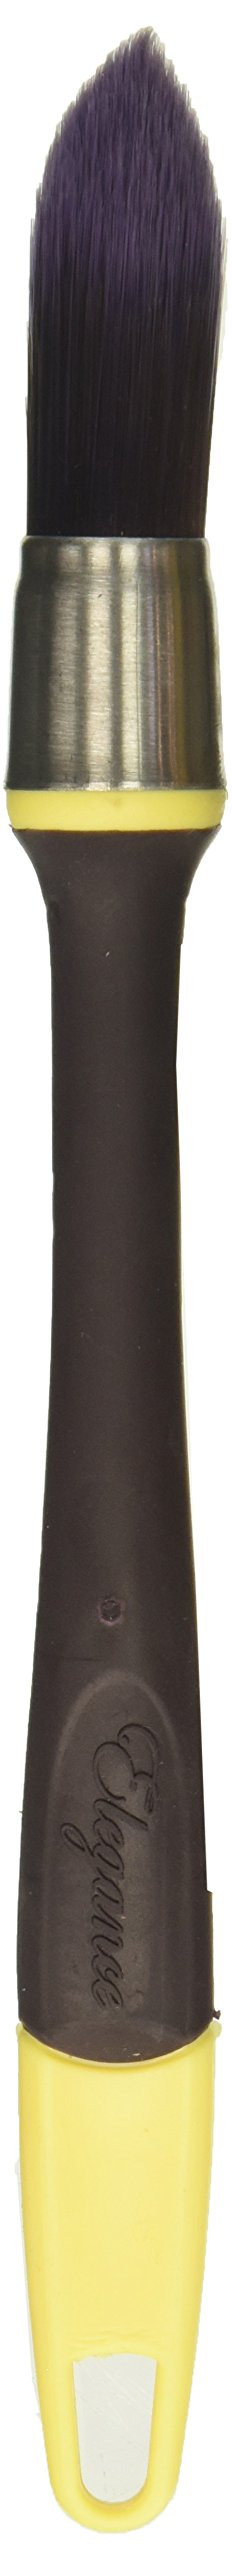 A Richard Tools Series A 13418 3//4 Elegance Trim Brush